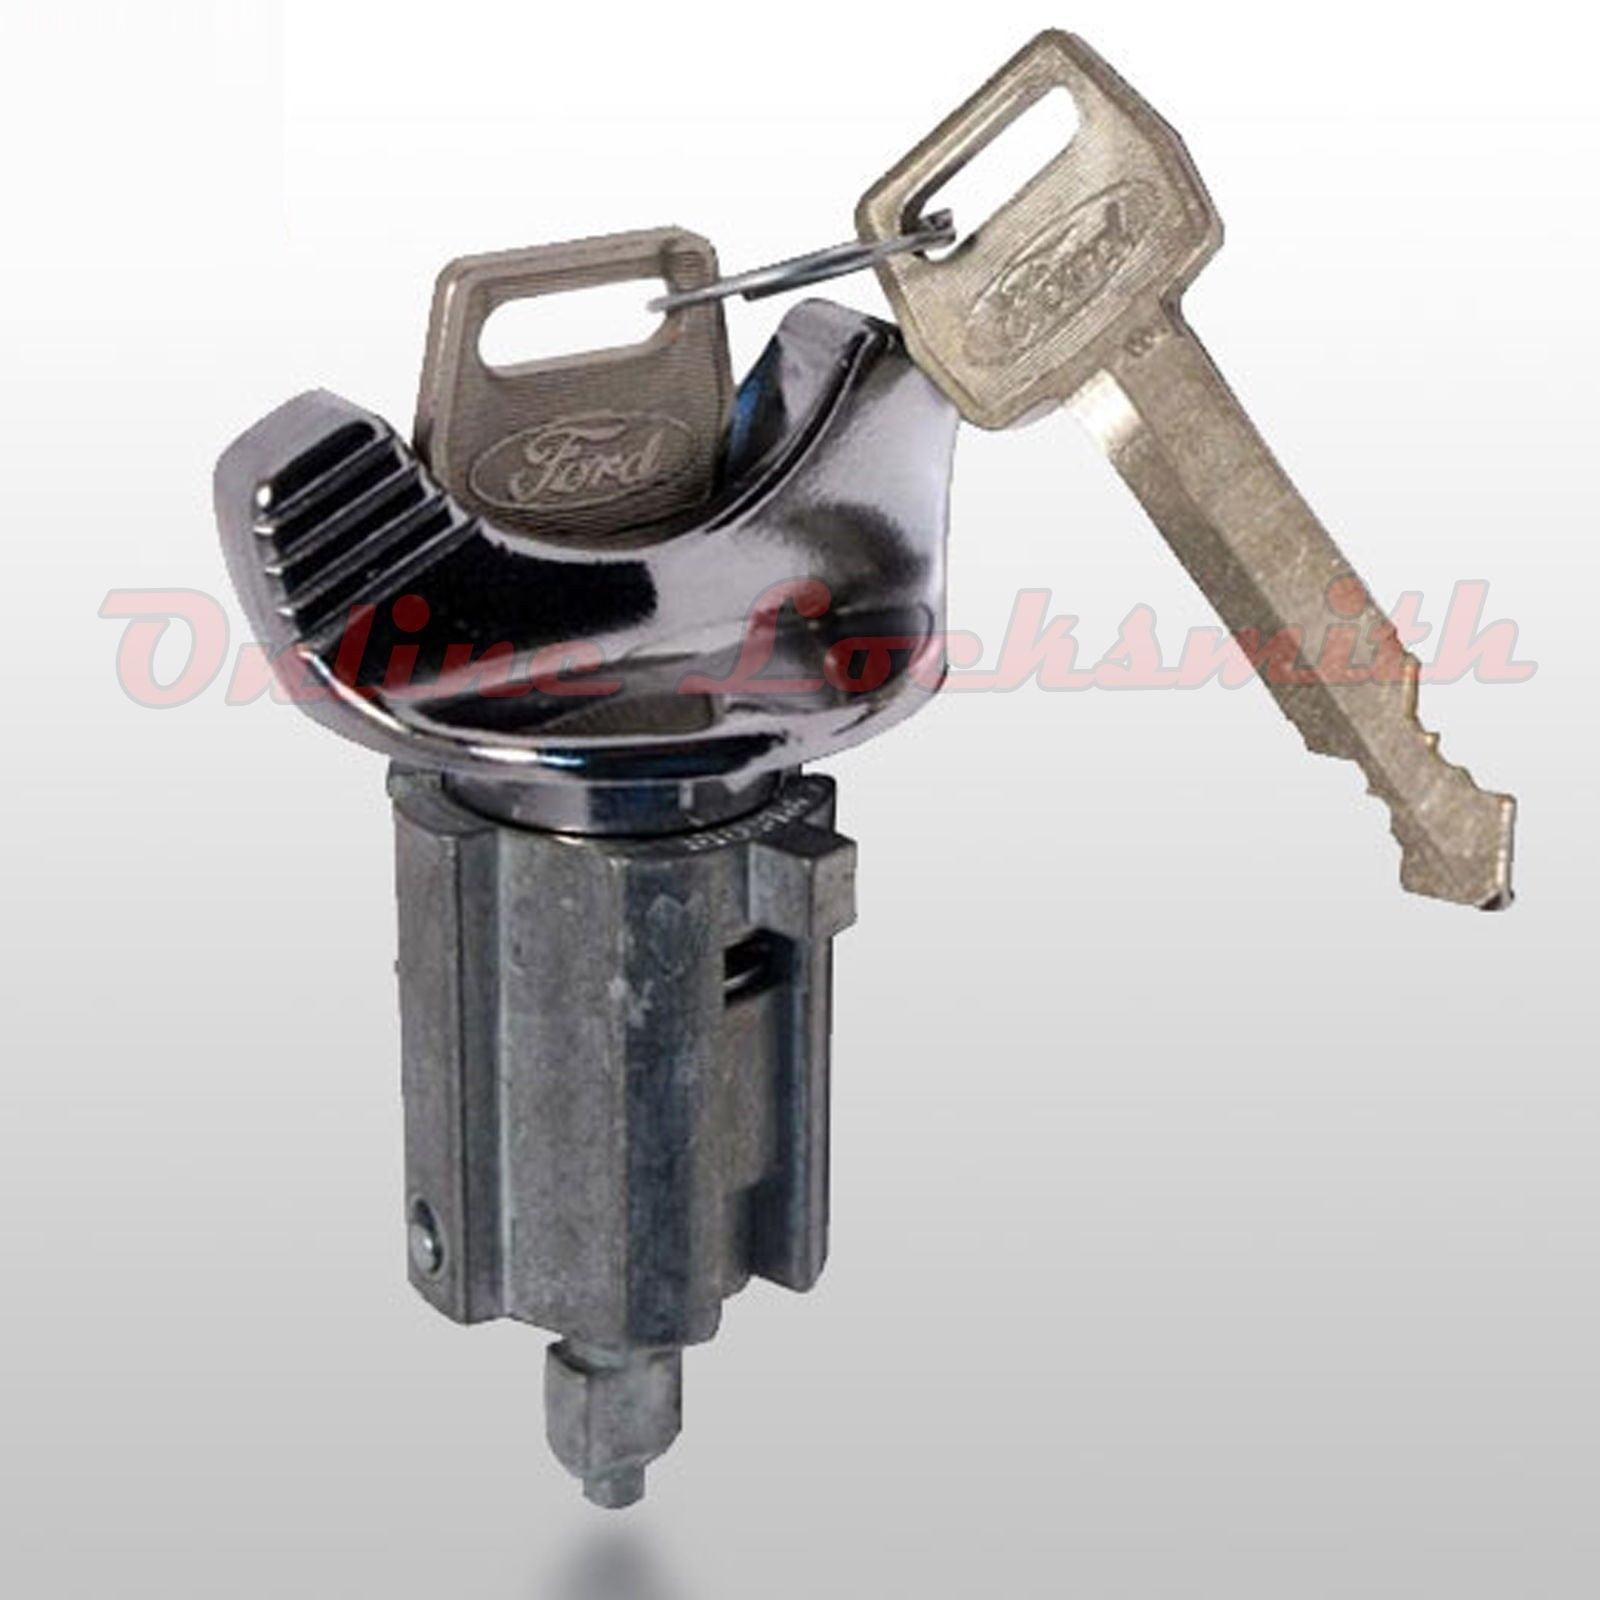 New Mercury Mystique 1990-1992 10-Cuts Coded Ignition Switch Cylinder w Two Keys